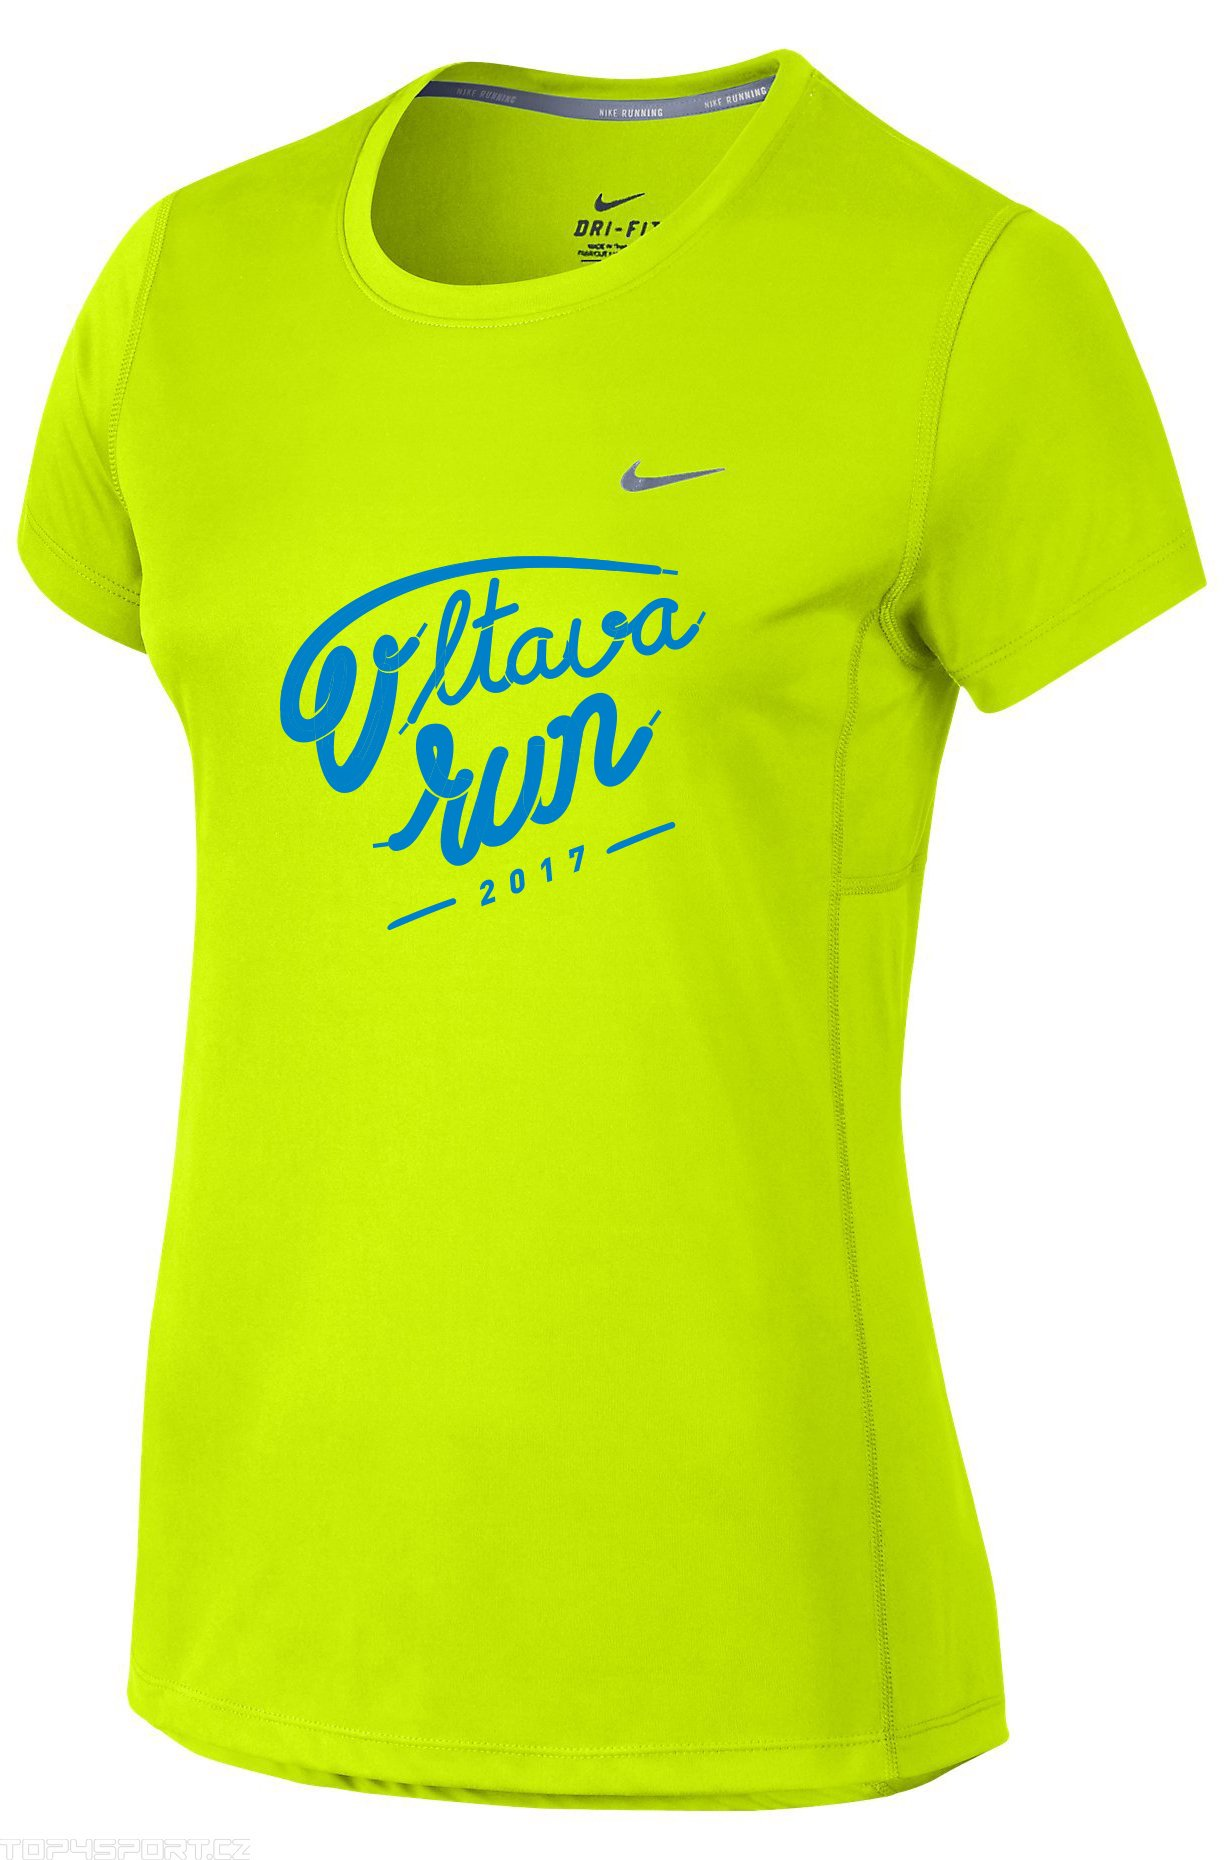 Běžecké triko Nike MILER VLTAVA RUN